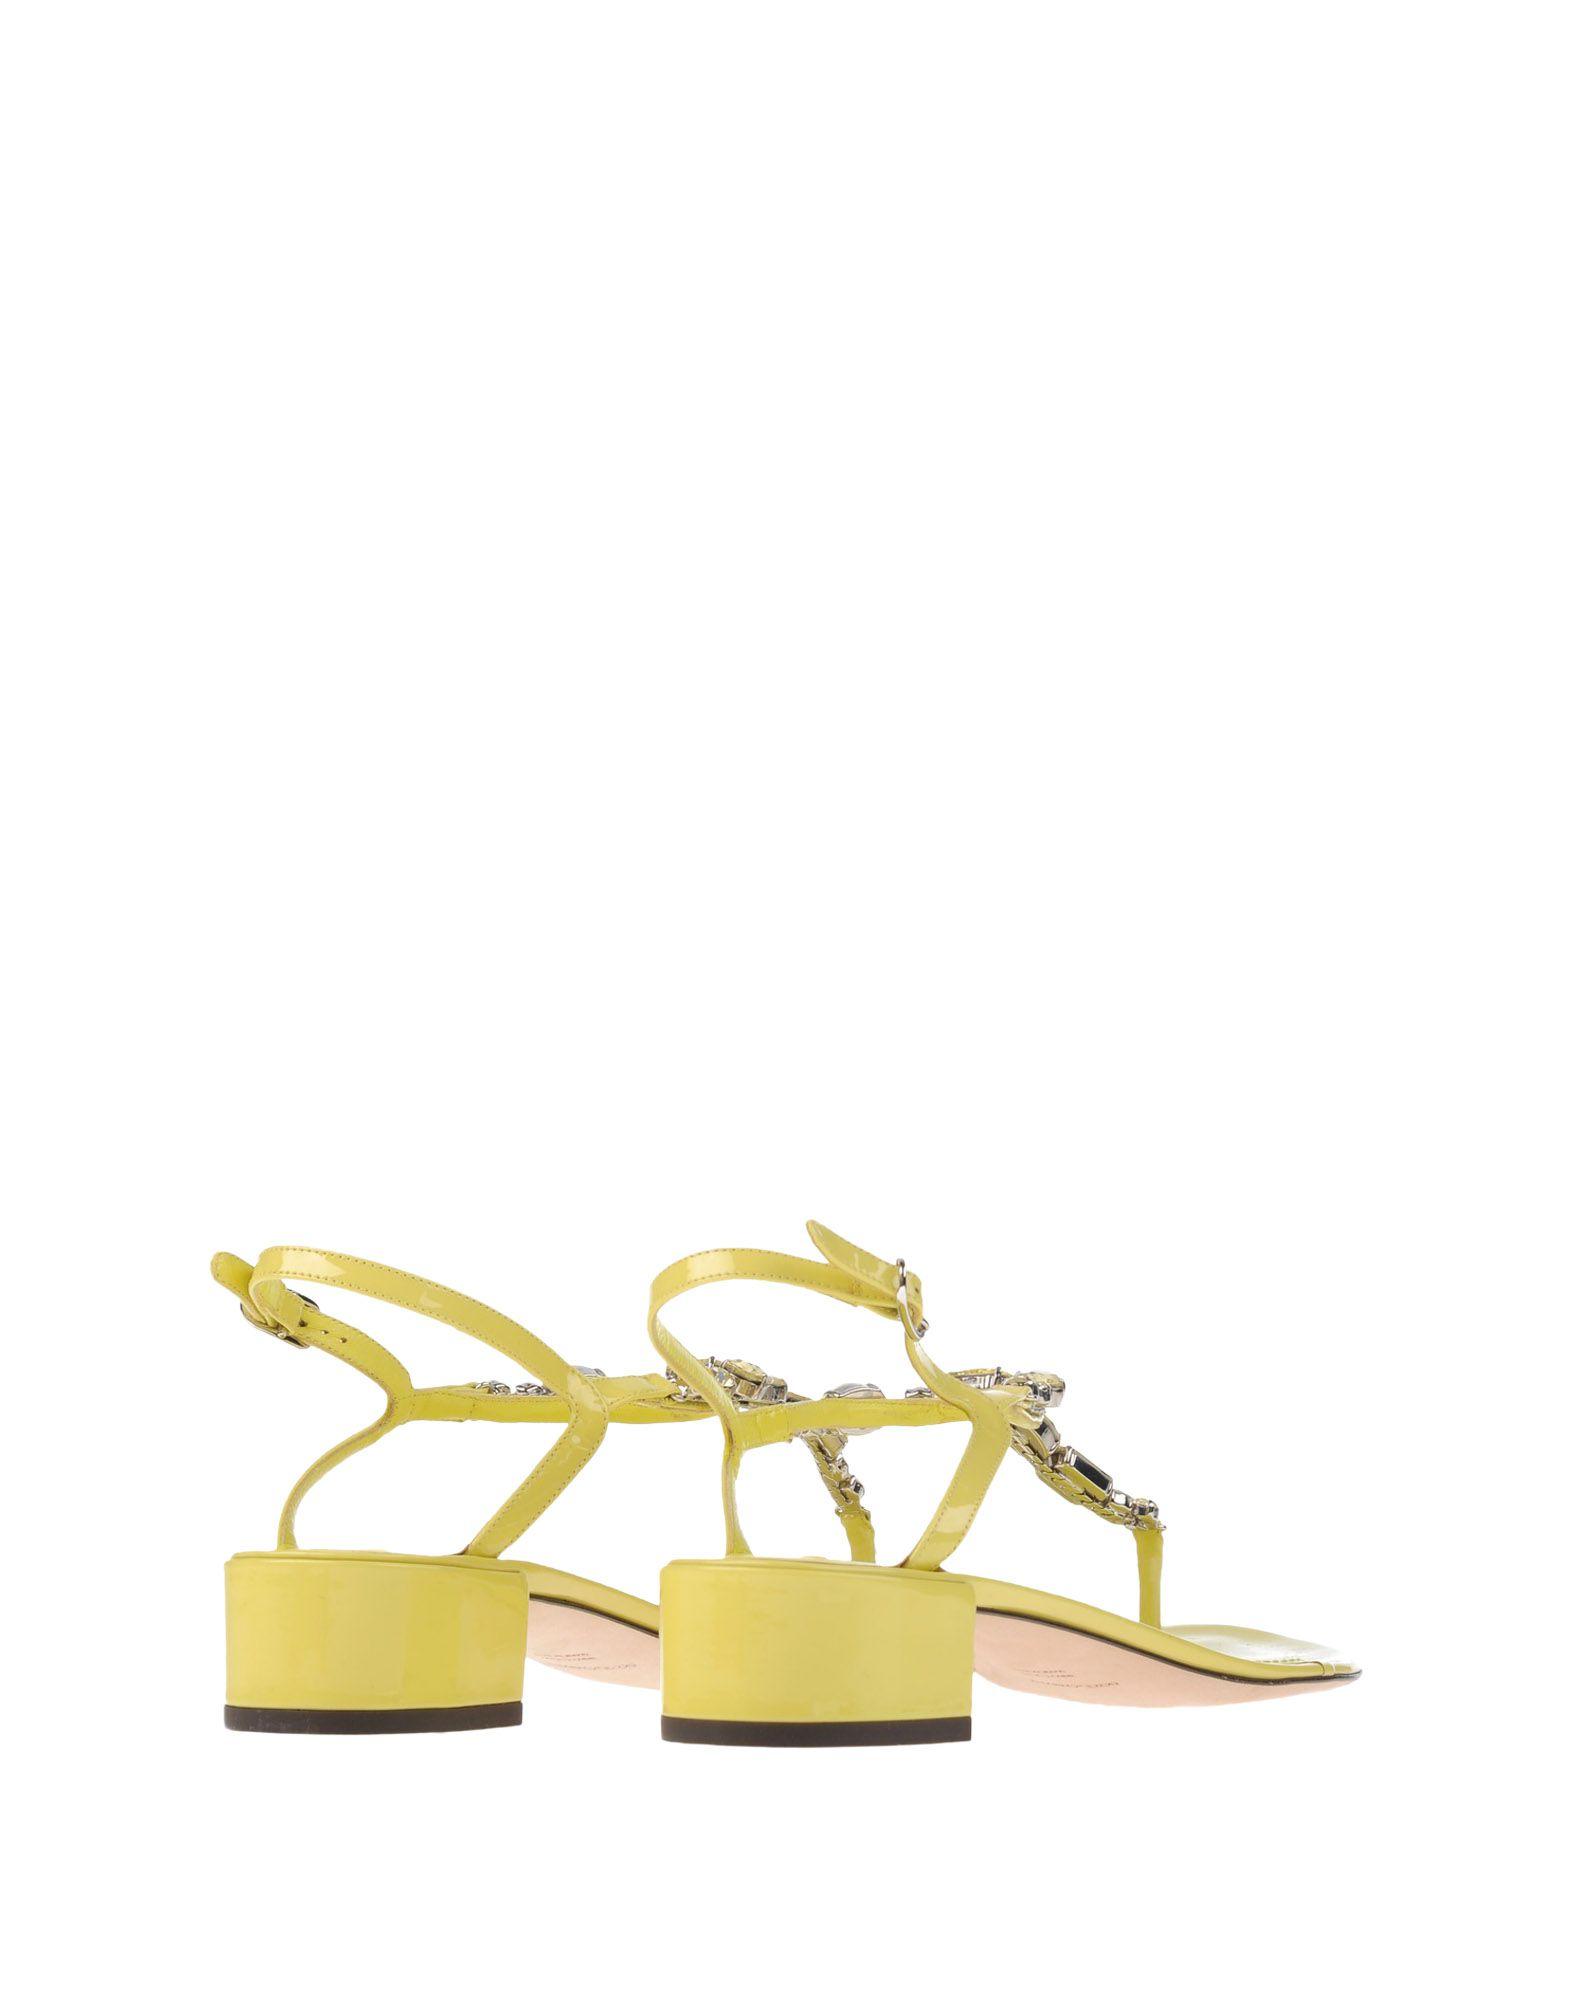 Dolce & Gabbana gut Dianetten Damen  11292932RWGünstige gut Gabbana aussehende Schuhe 84aa20